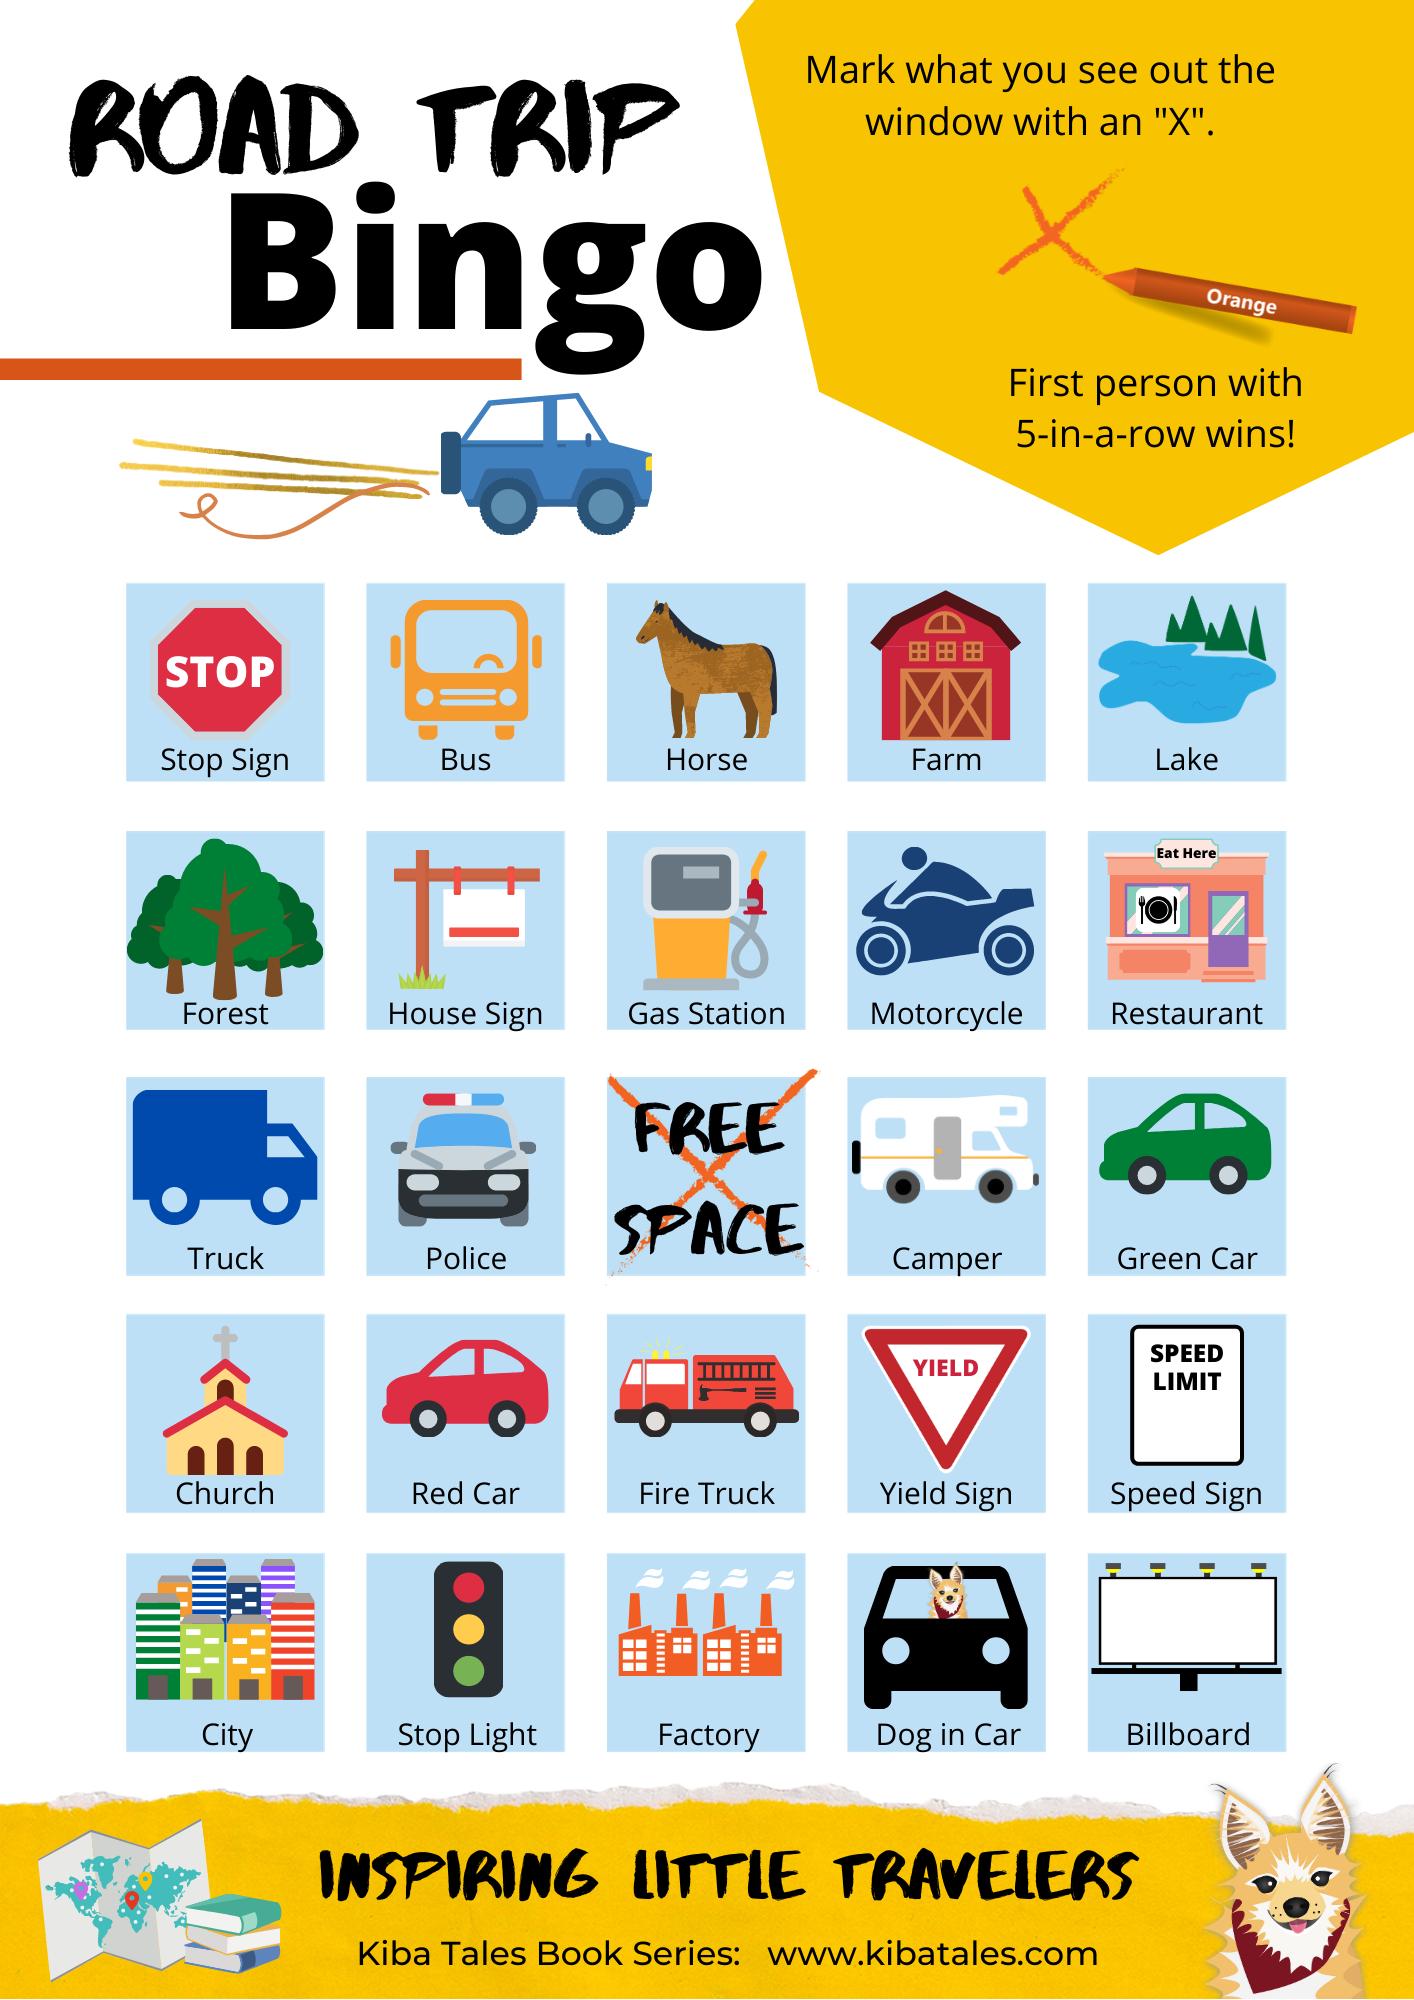 Road Trip Bingo Cards - U.S. Edition